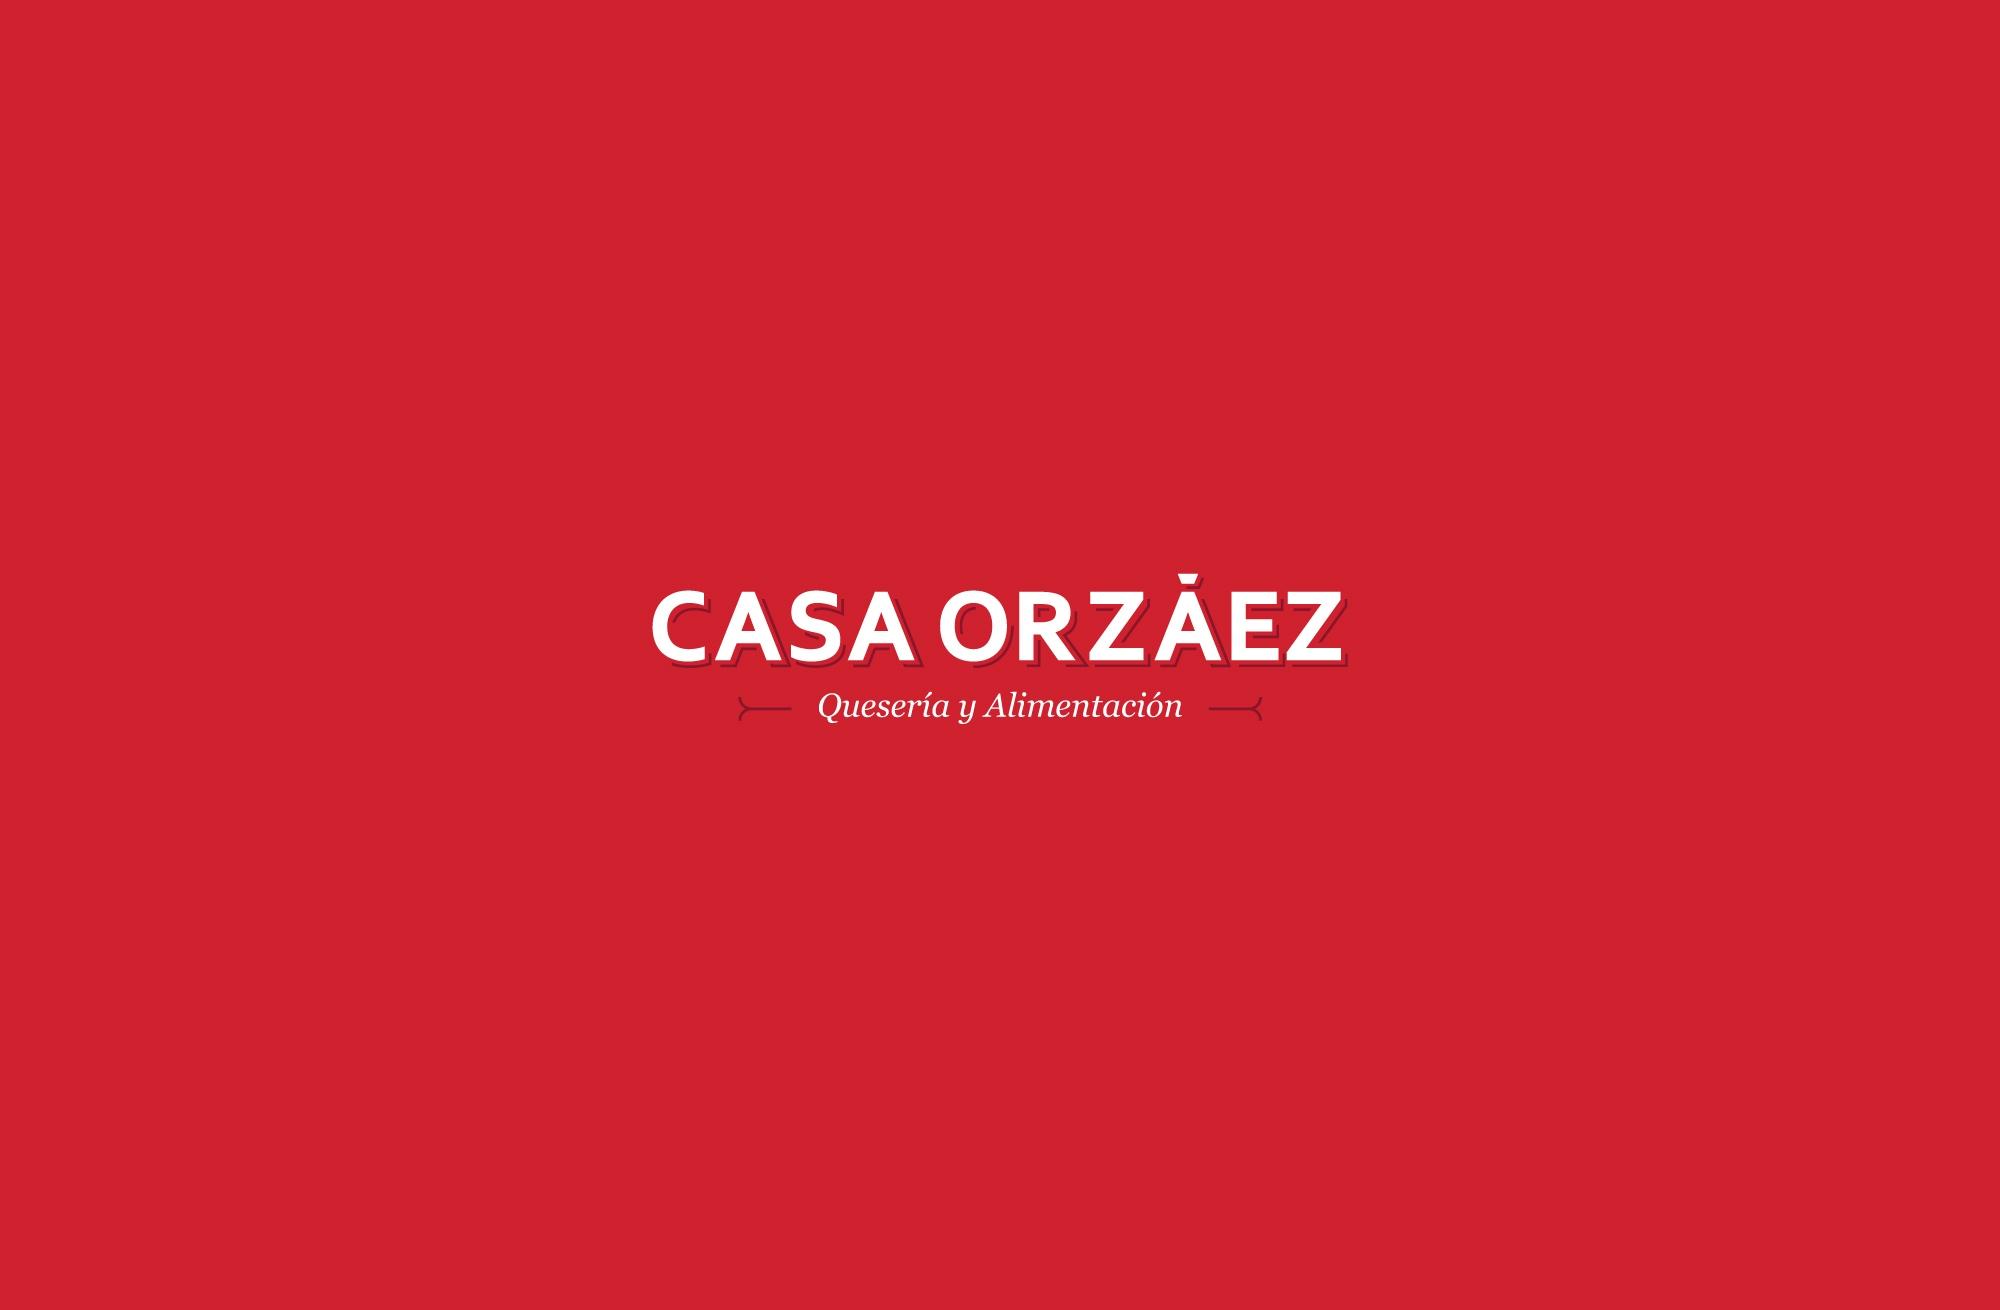 Branding Casa Orzáez Quesos y Alimentación rojo